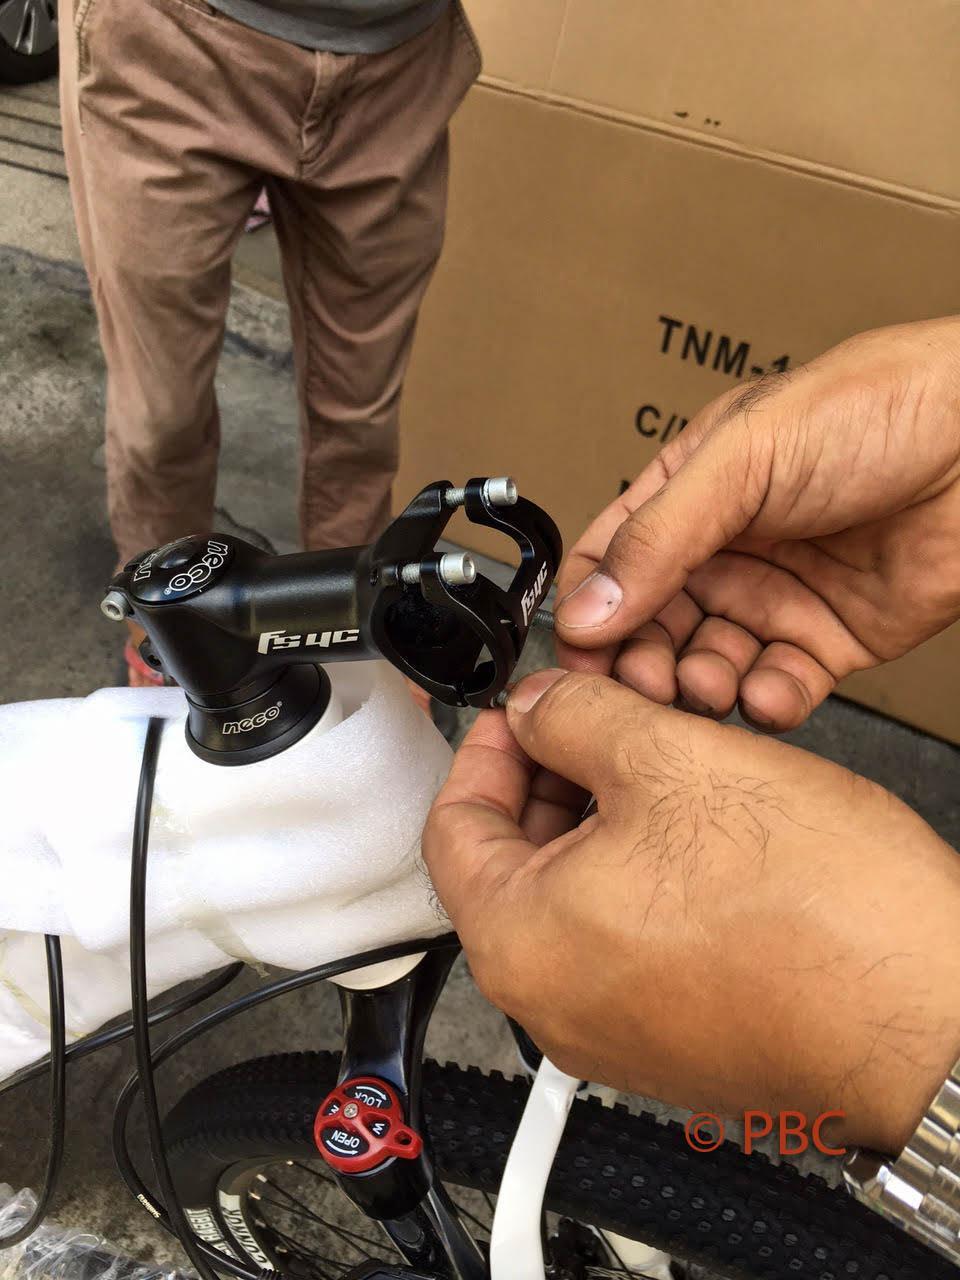 Connor Mountain Bike 29x16 Alloy Hydraulic Disc Brakes Mtb Lazada Ph Pedal Neco Wp 625 Mtb8